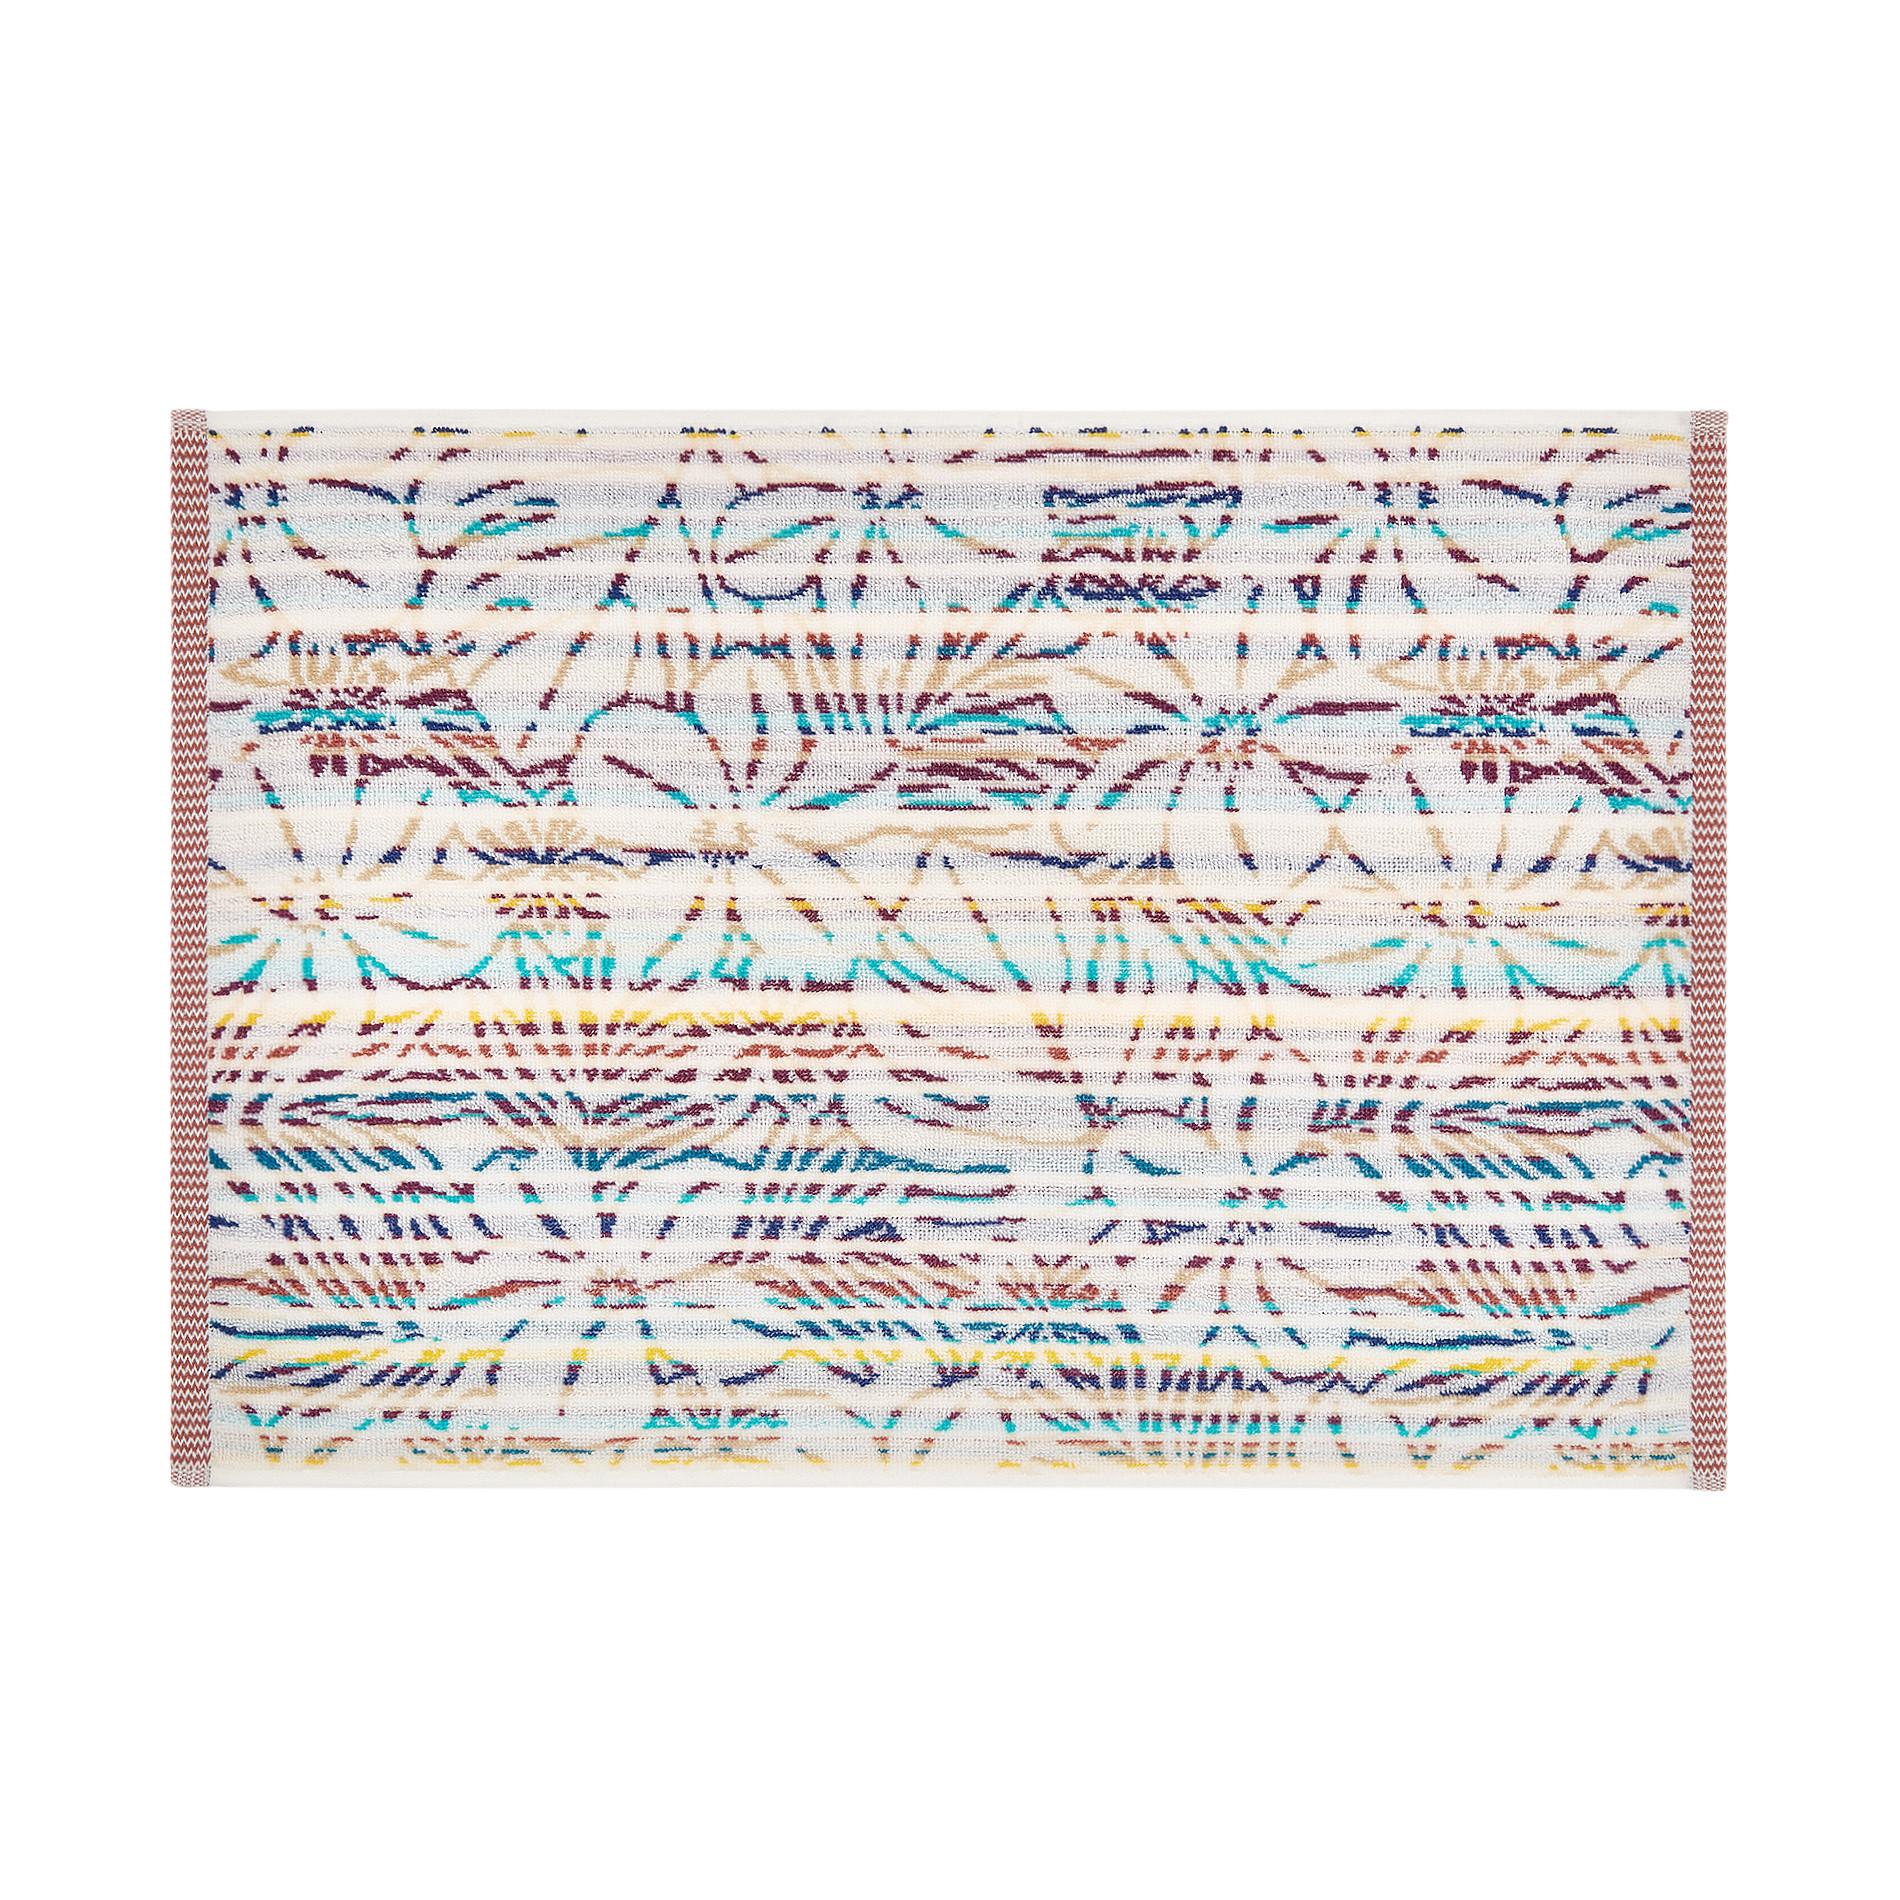 Asciugamano cotone jacquard motivo tropicale, Multicolor, large image number 1